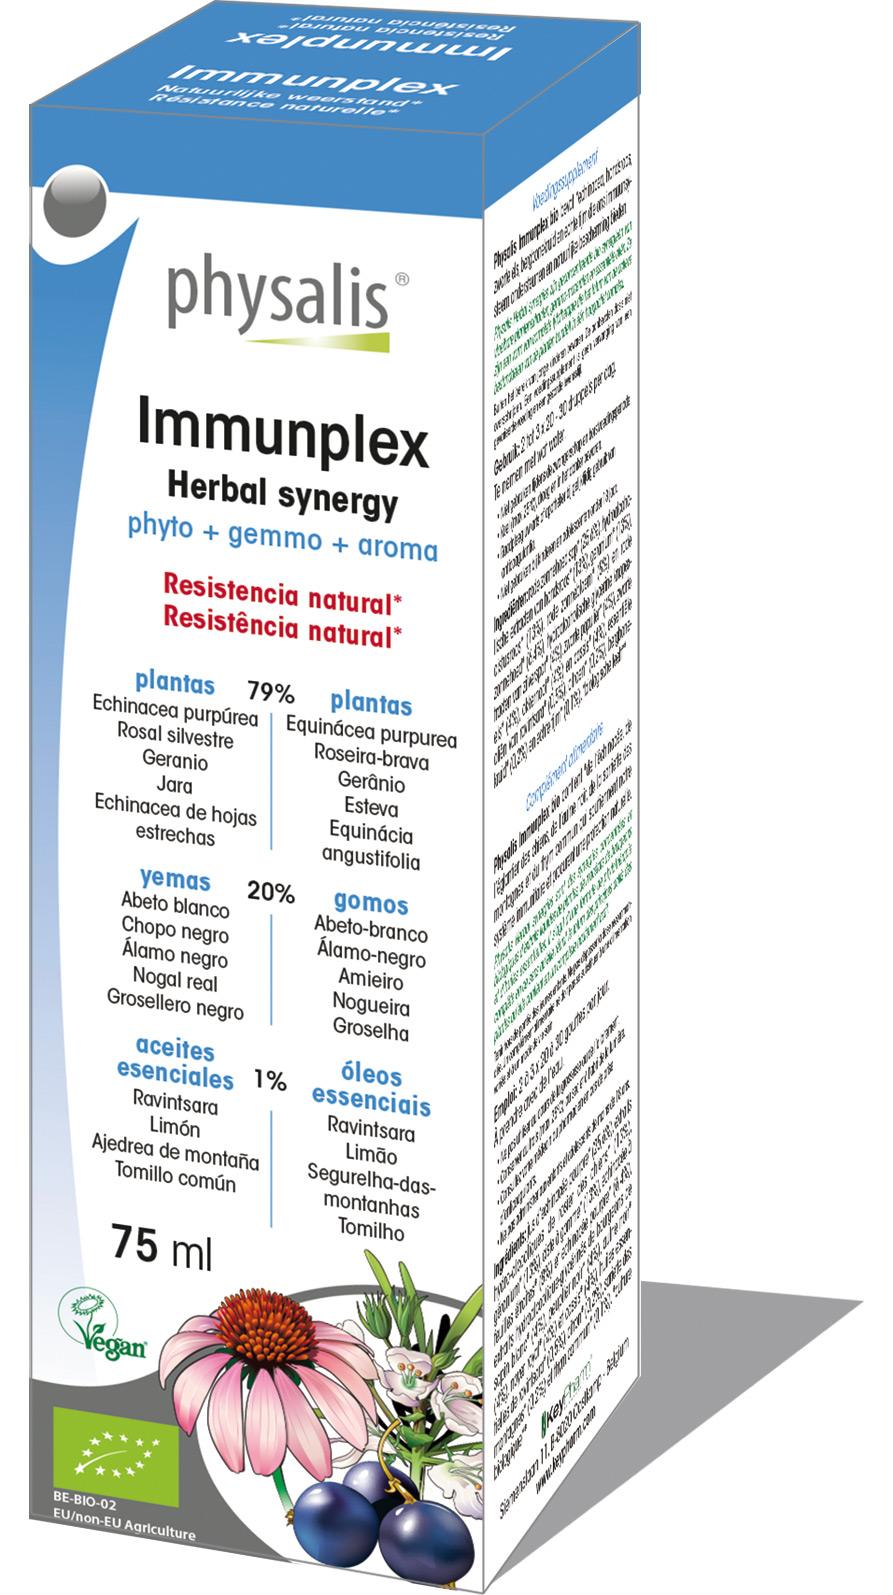 Immunplex - Herbal Synergy